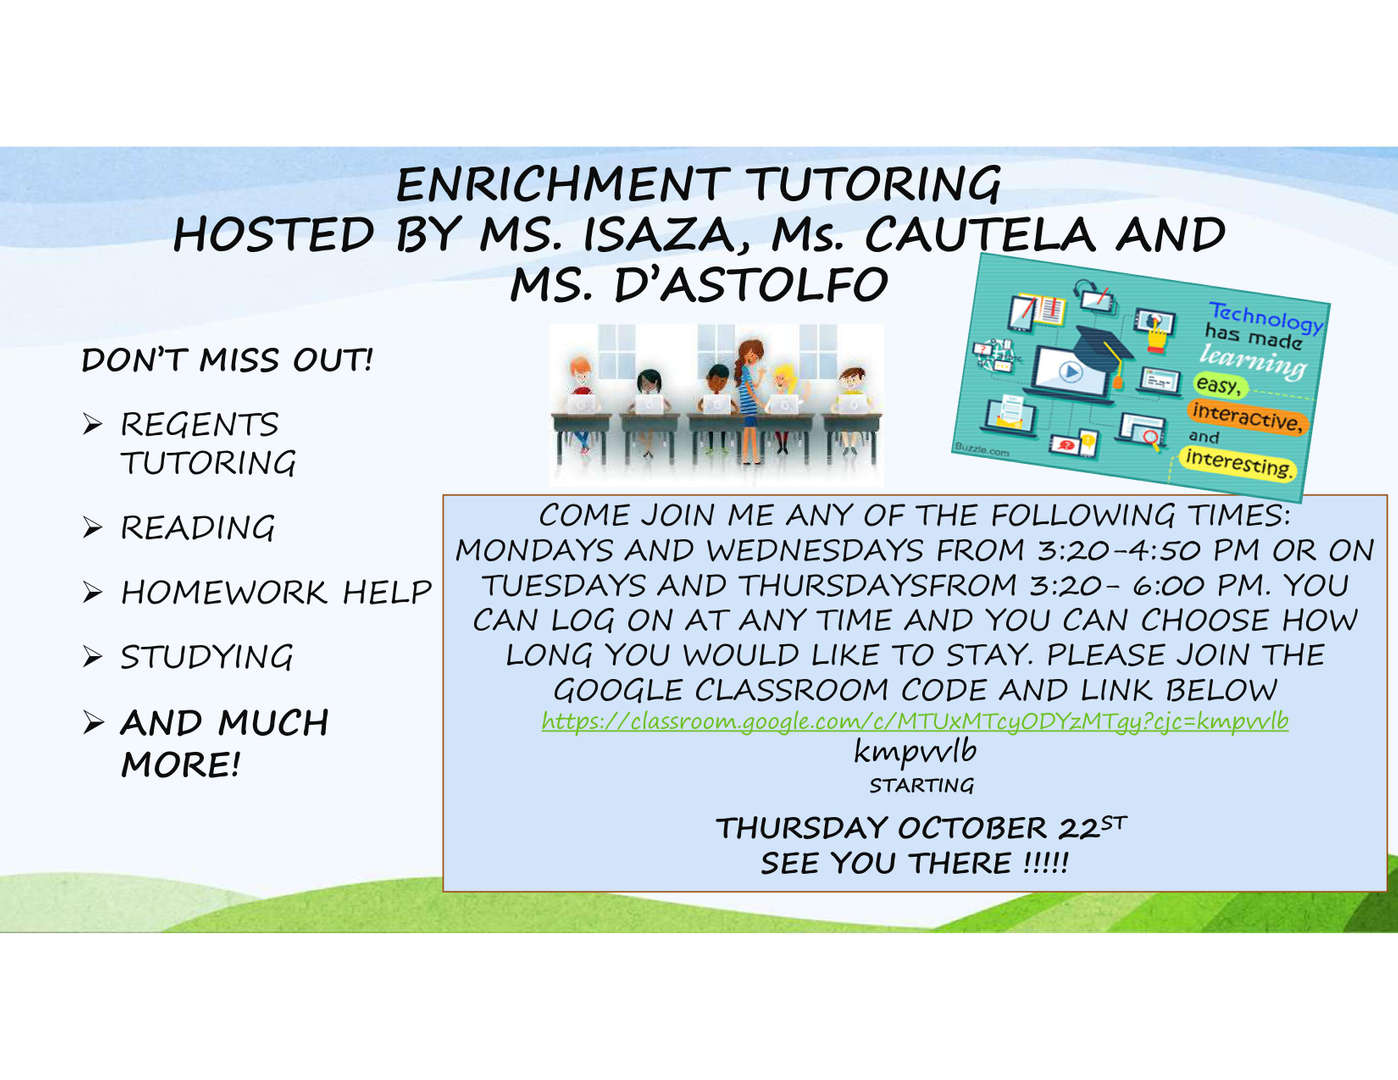 Enrichment tutoring